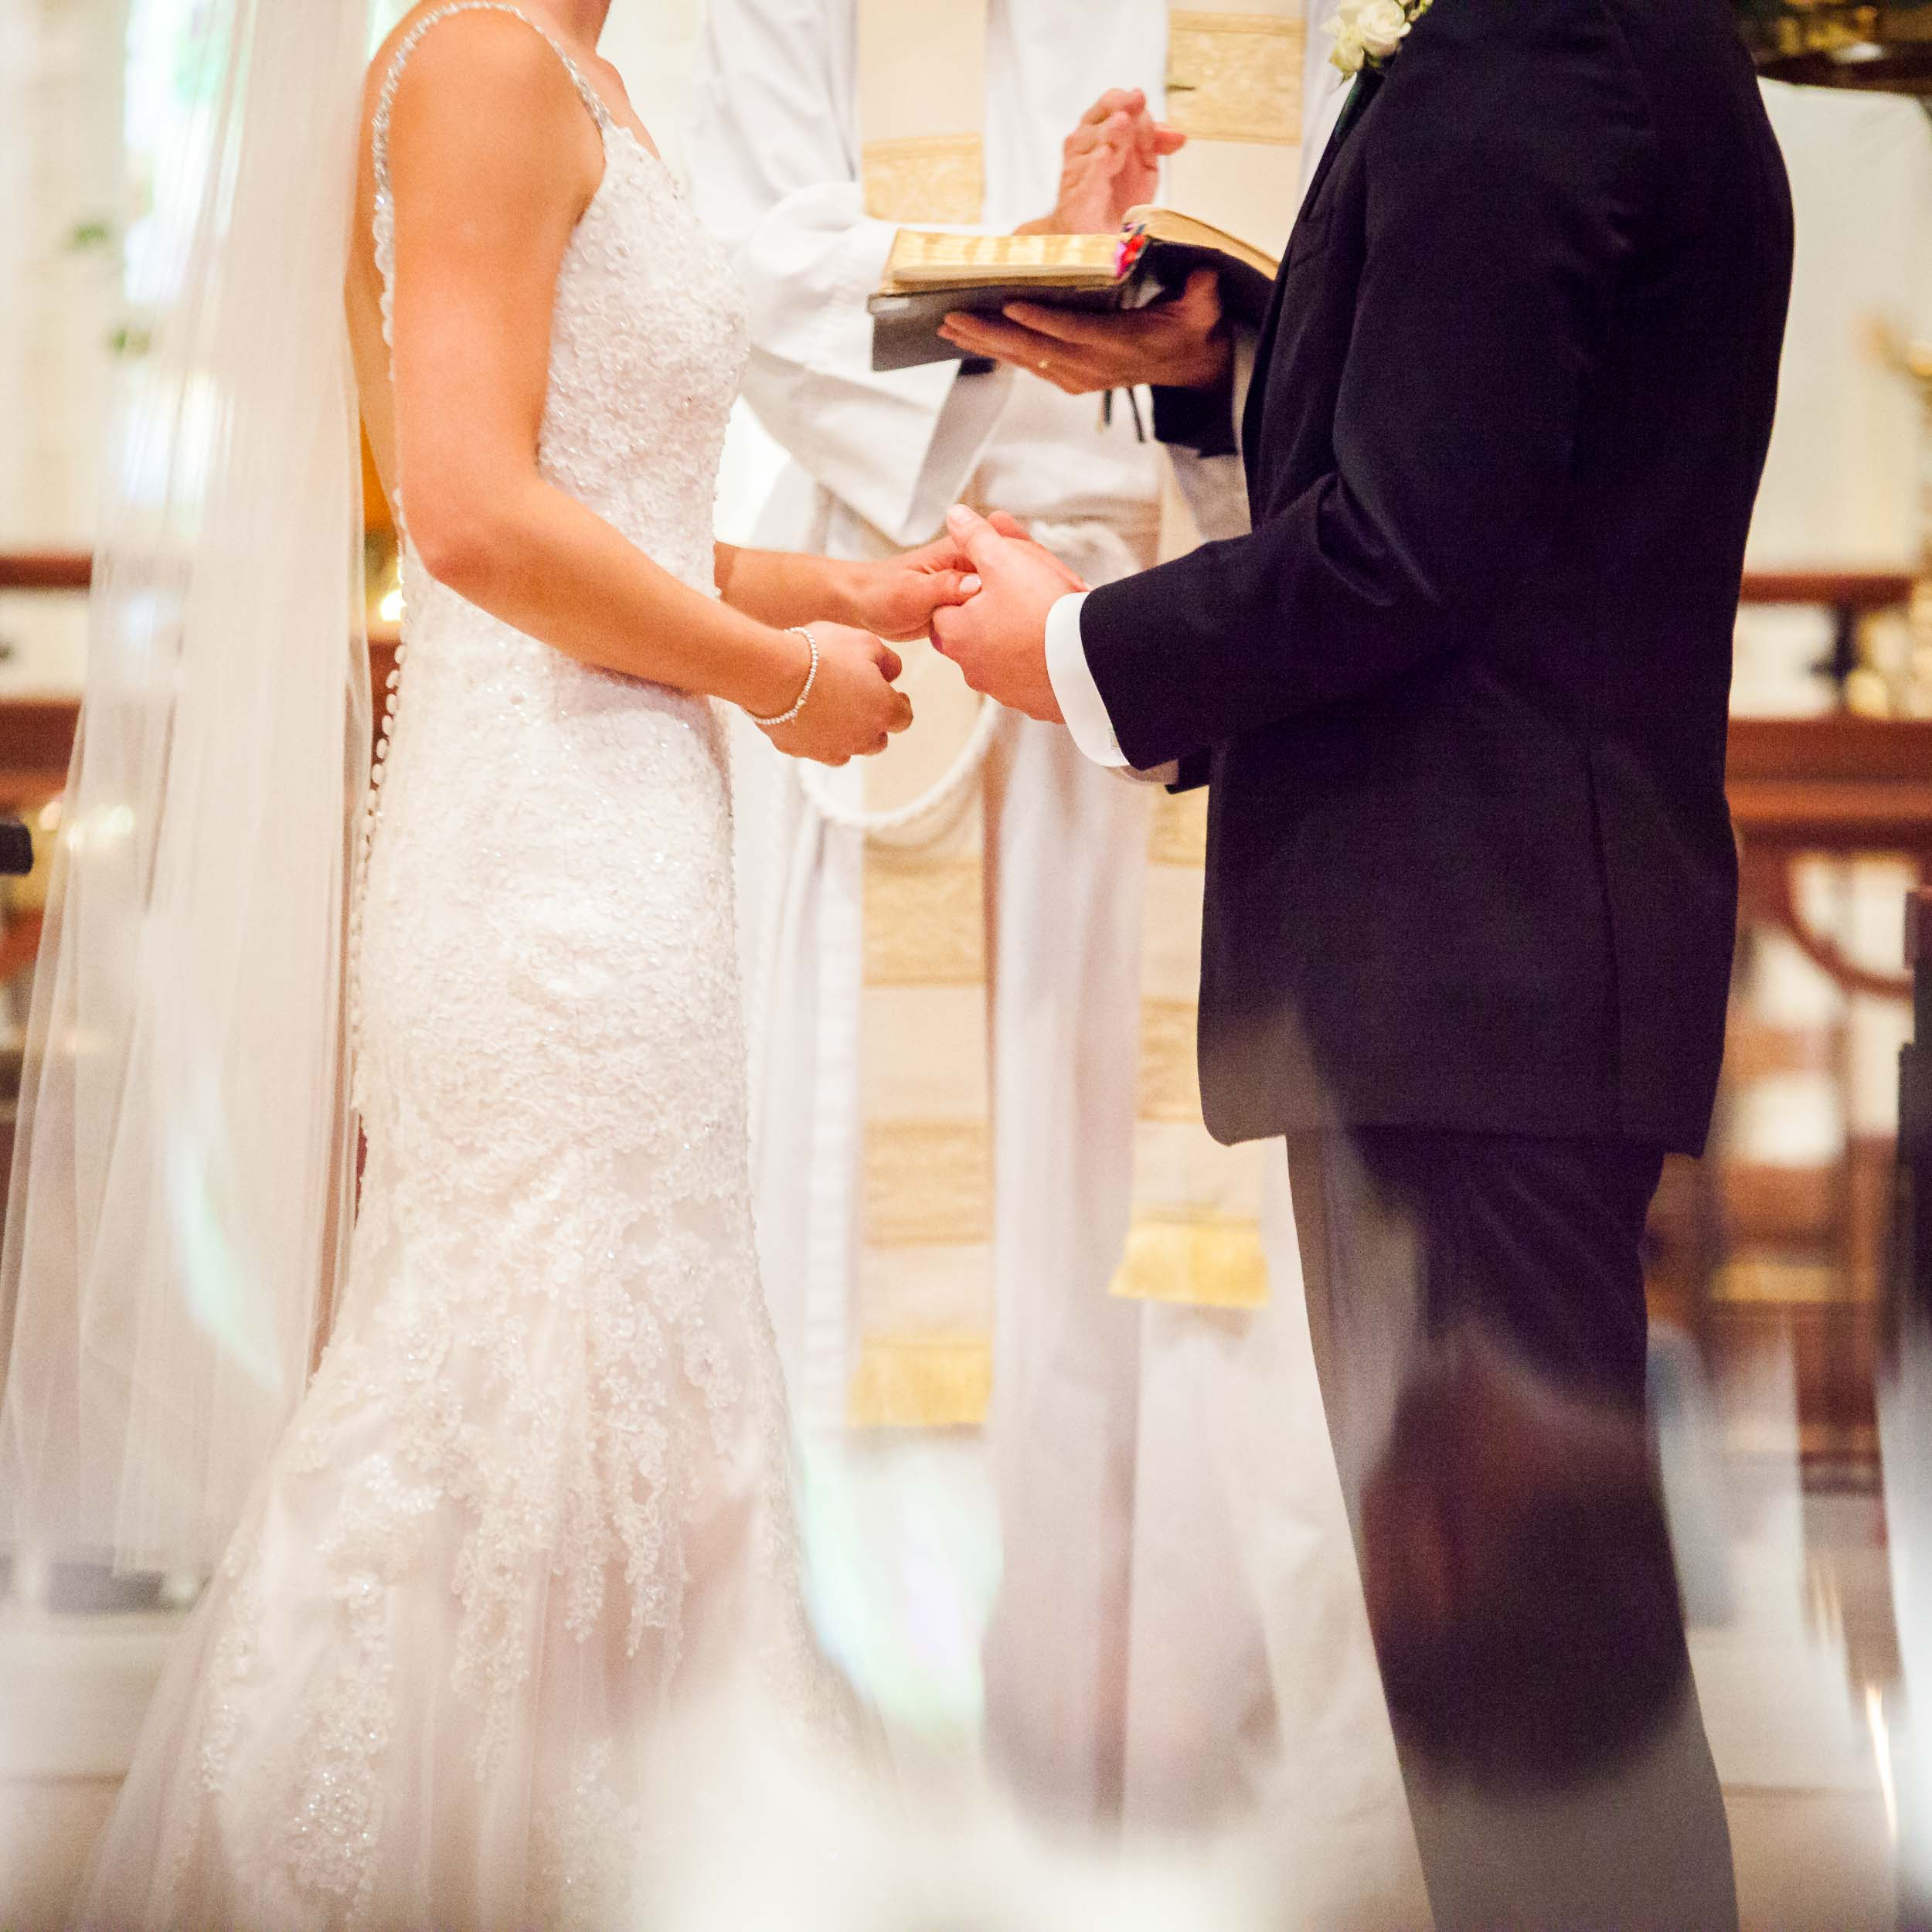 Flordia-Wedding-Photography-41.jpg